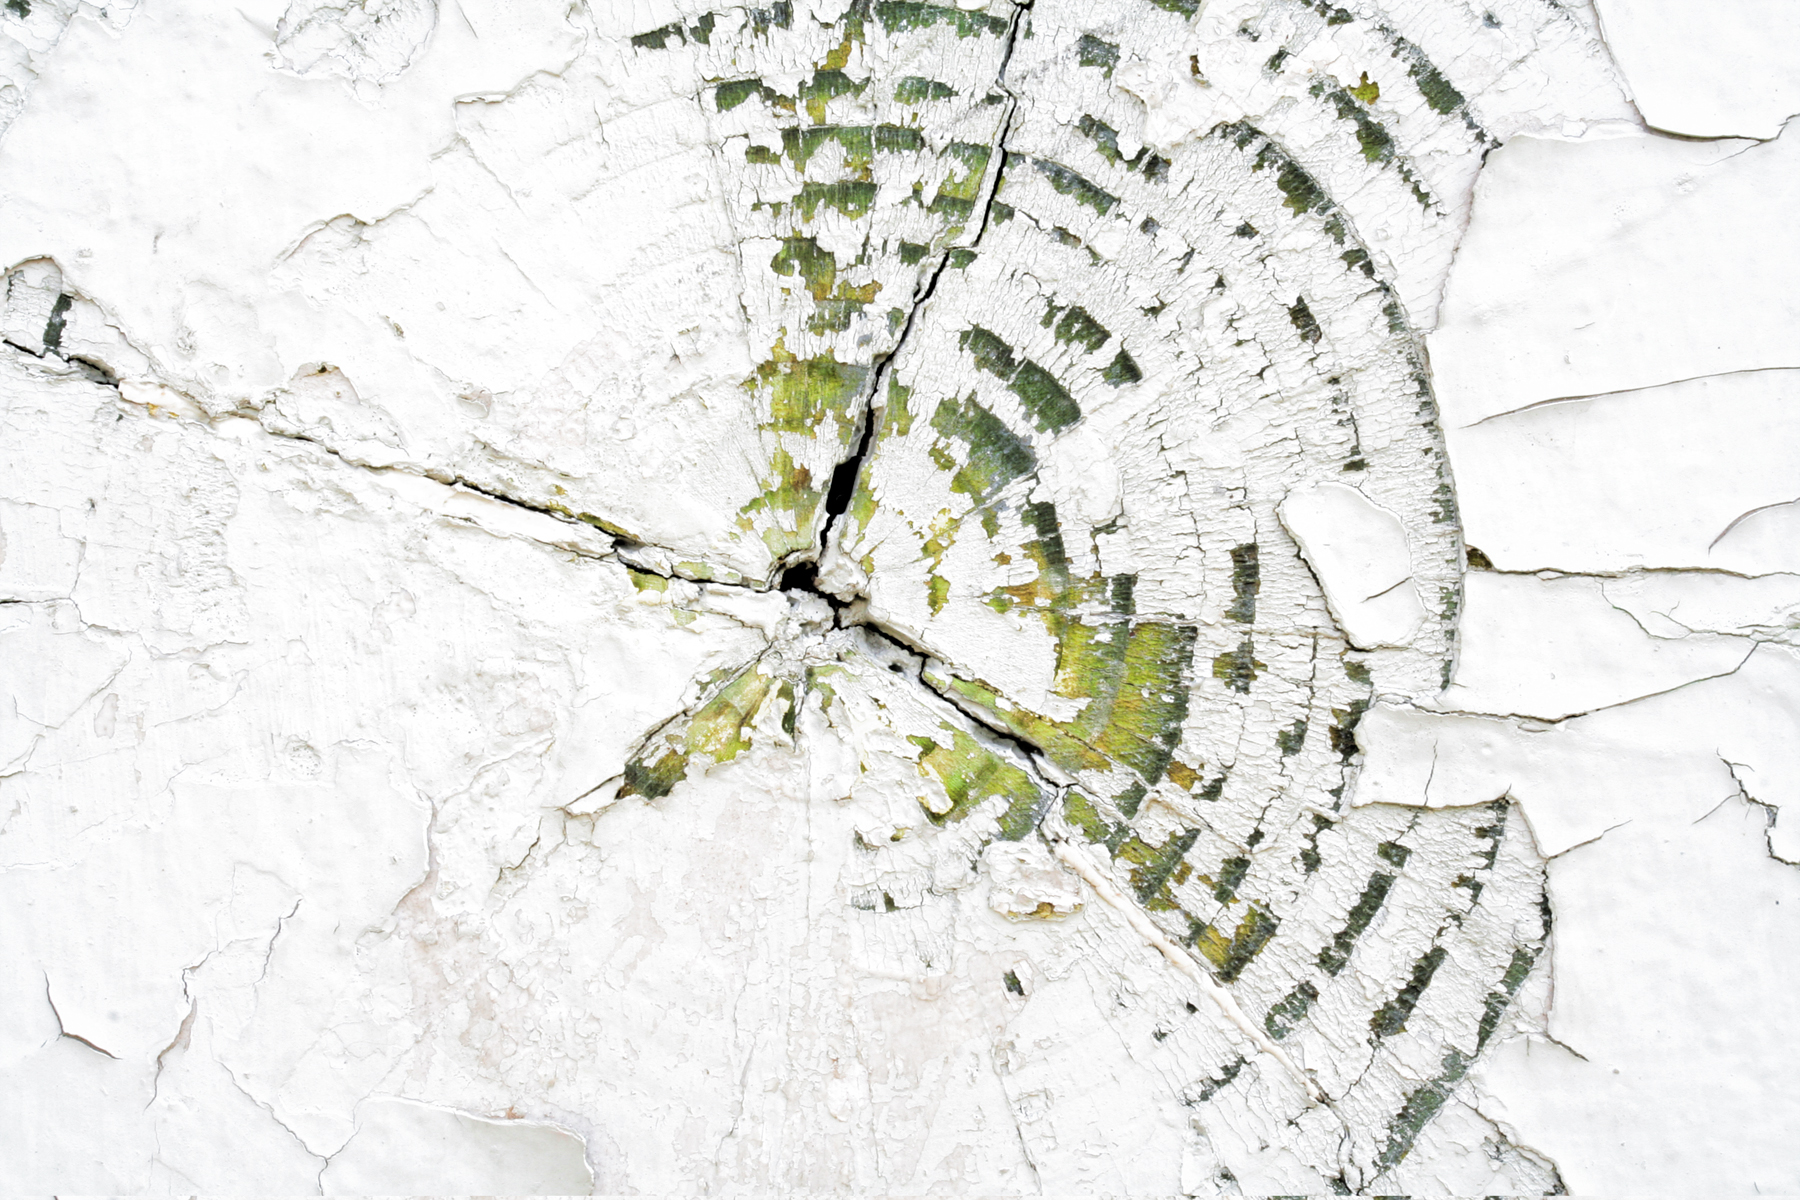 Cracked Wood Texture, Aged, Textural, Peeled, Peeling, HQ Photo